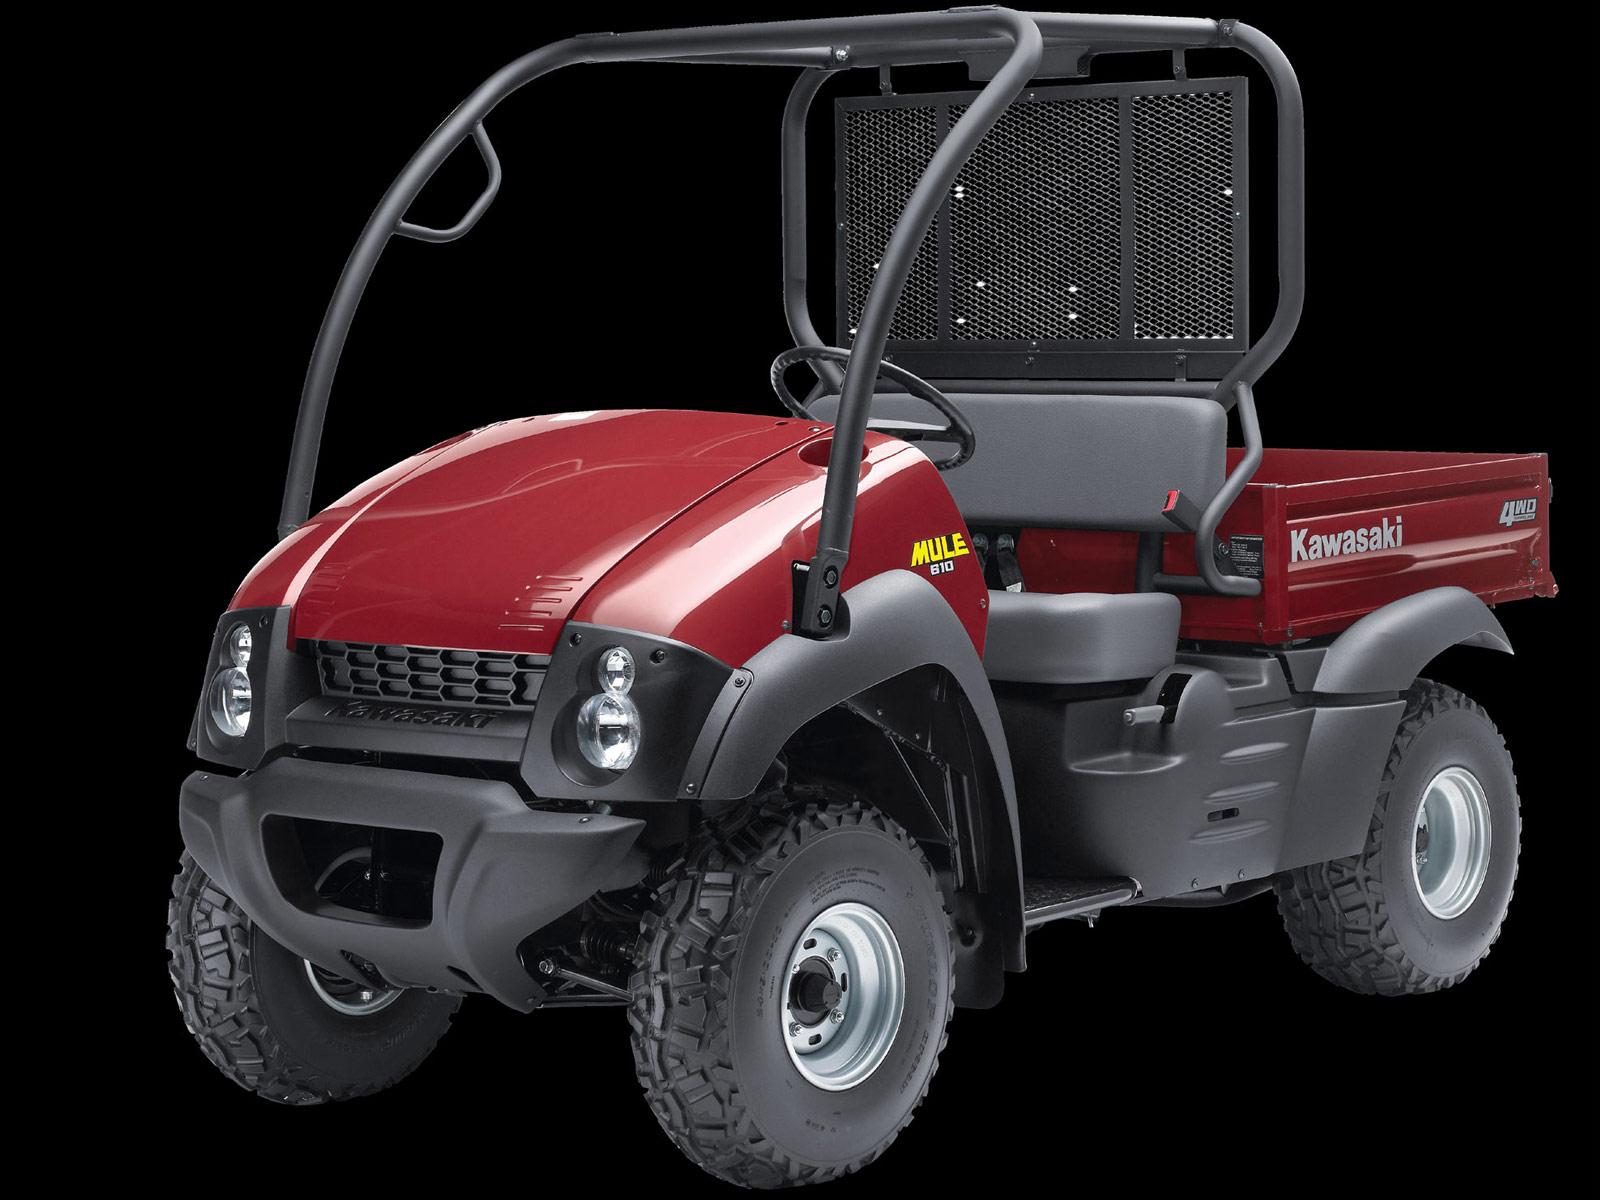 2013 Kawasaki Mule 610 4x4 ATV Insurance Information  pictures